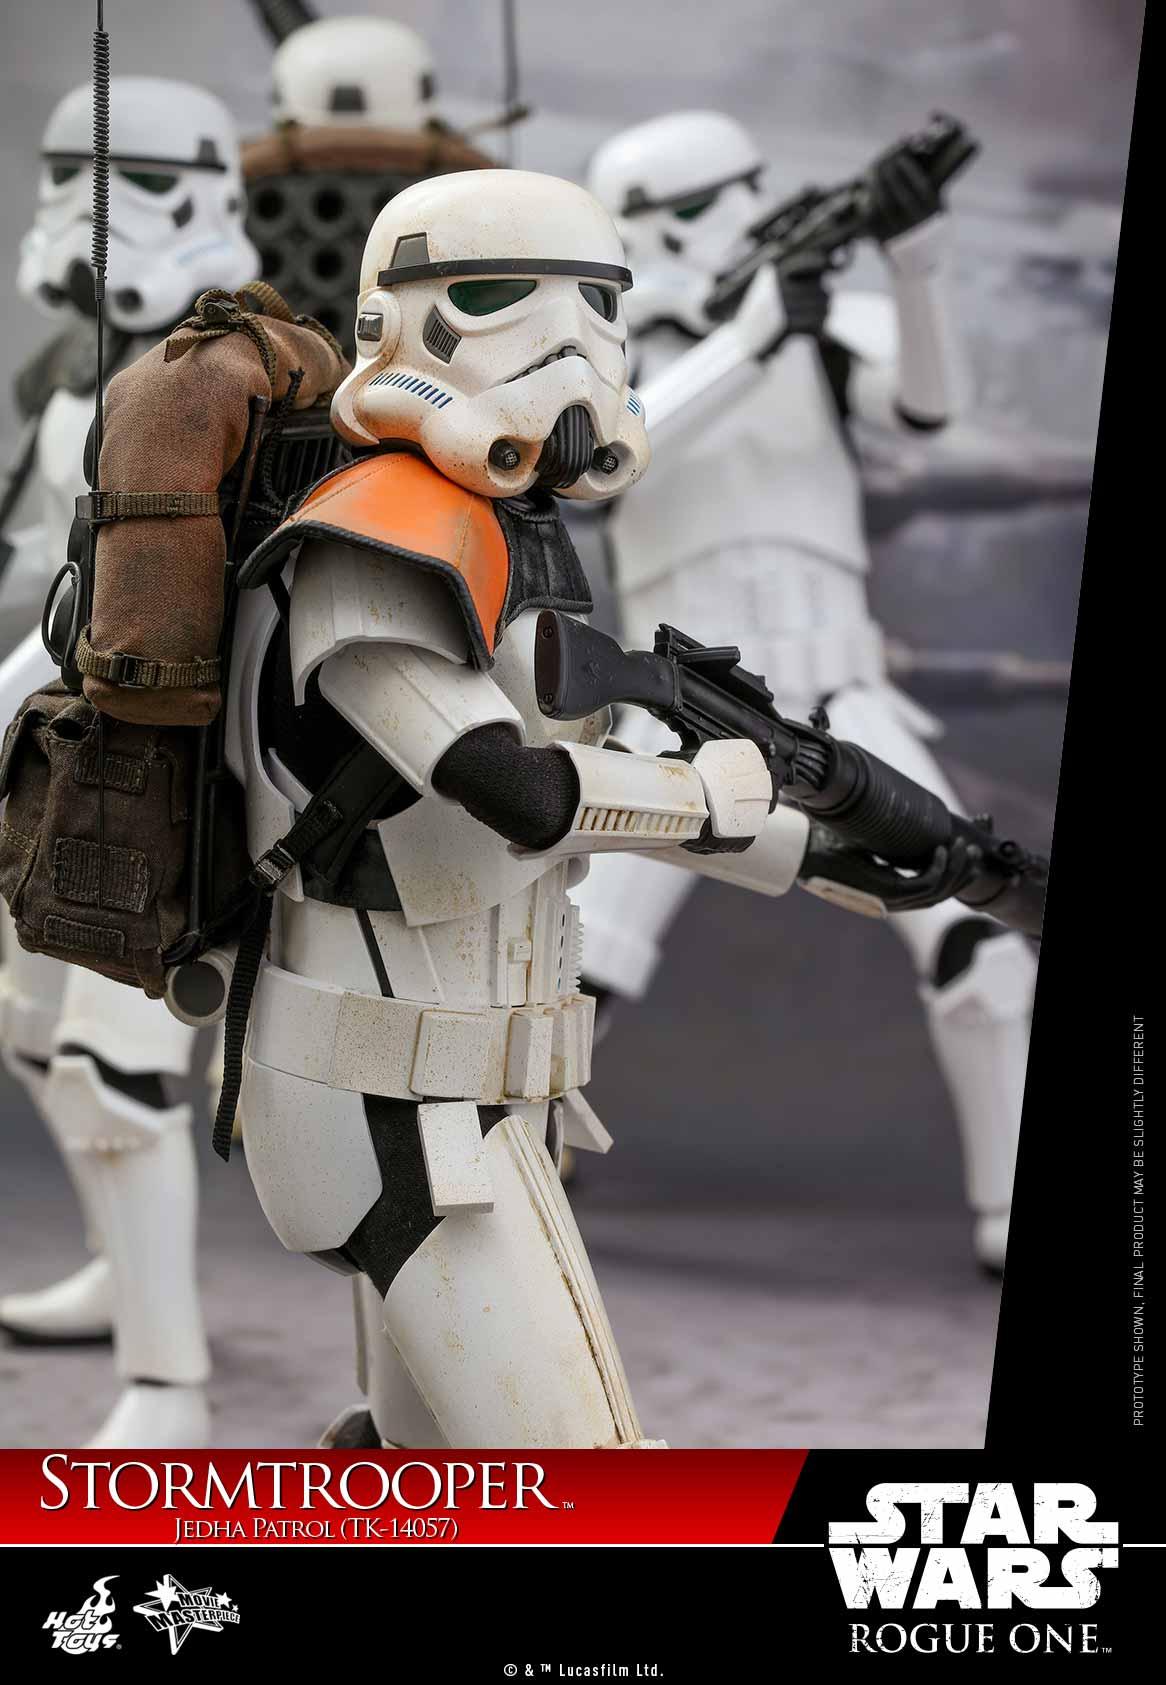 hot-toys-swro-stormtrooper-jedha-patrol-tk-14057-collectible-figure_pr3